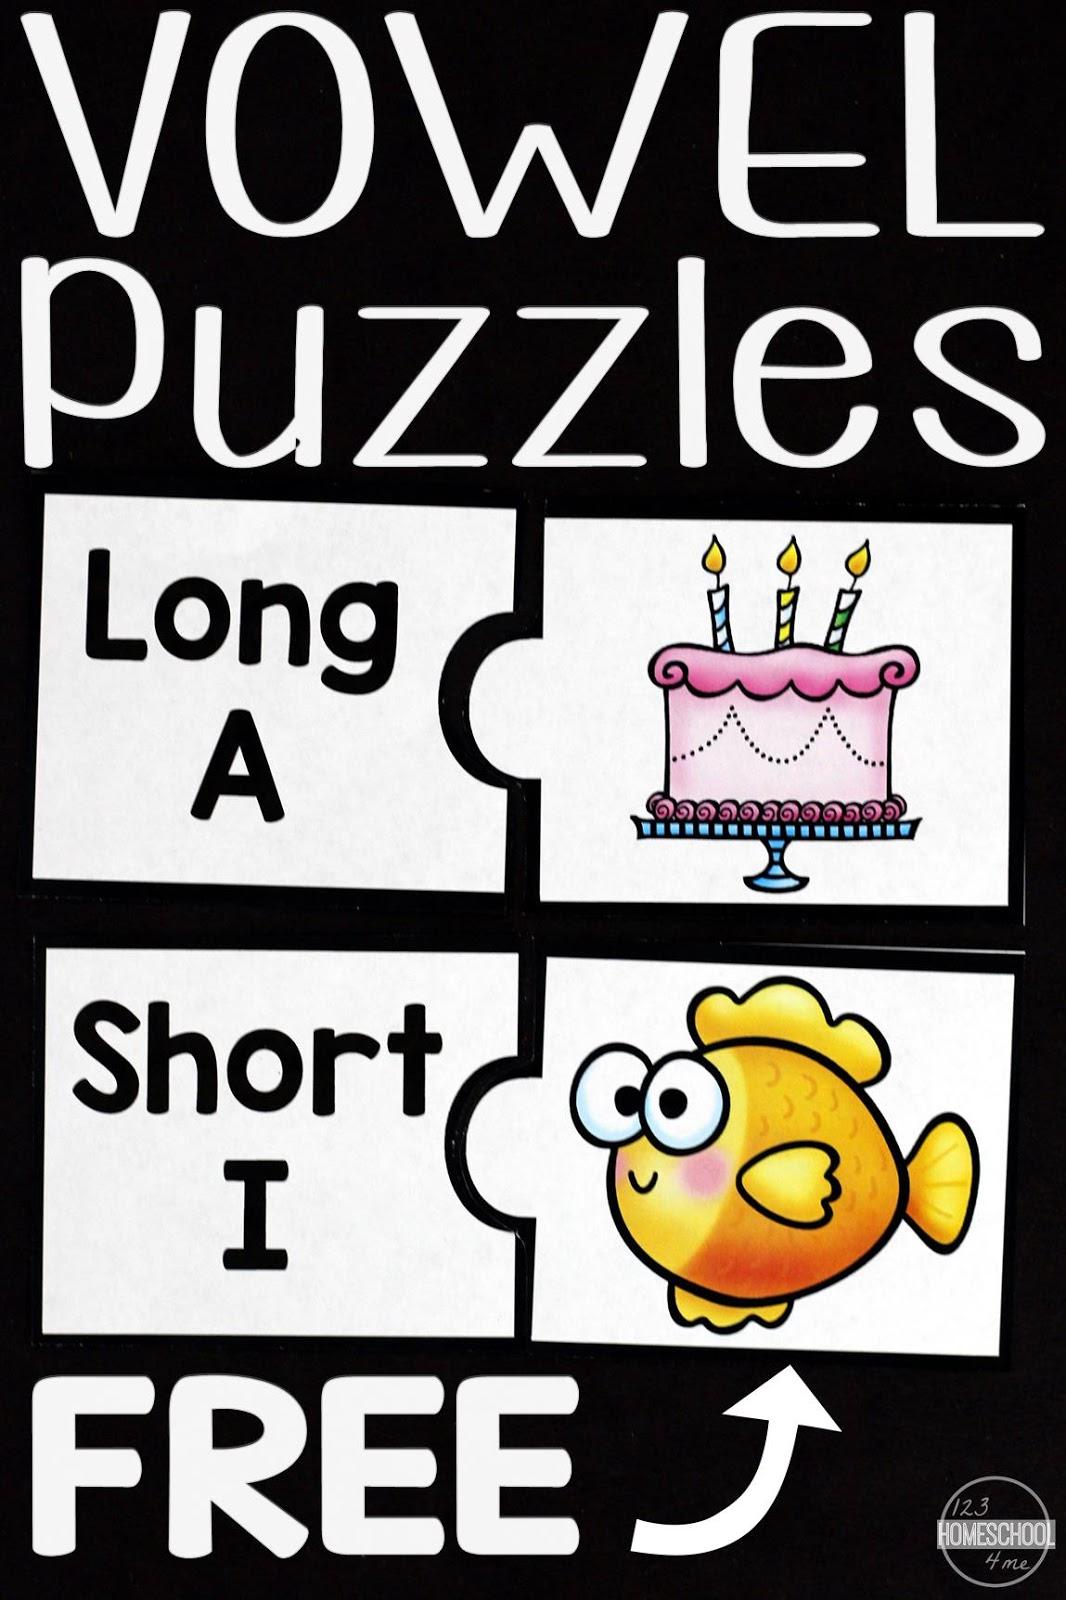 Free Vowels Puzzles